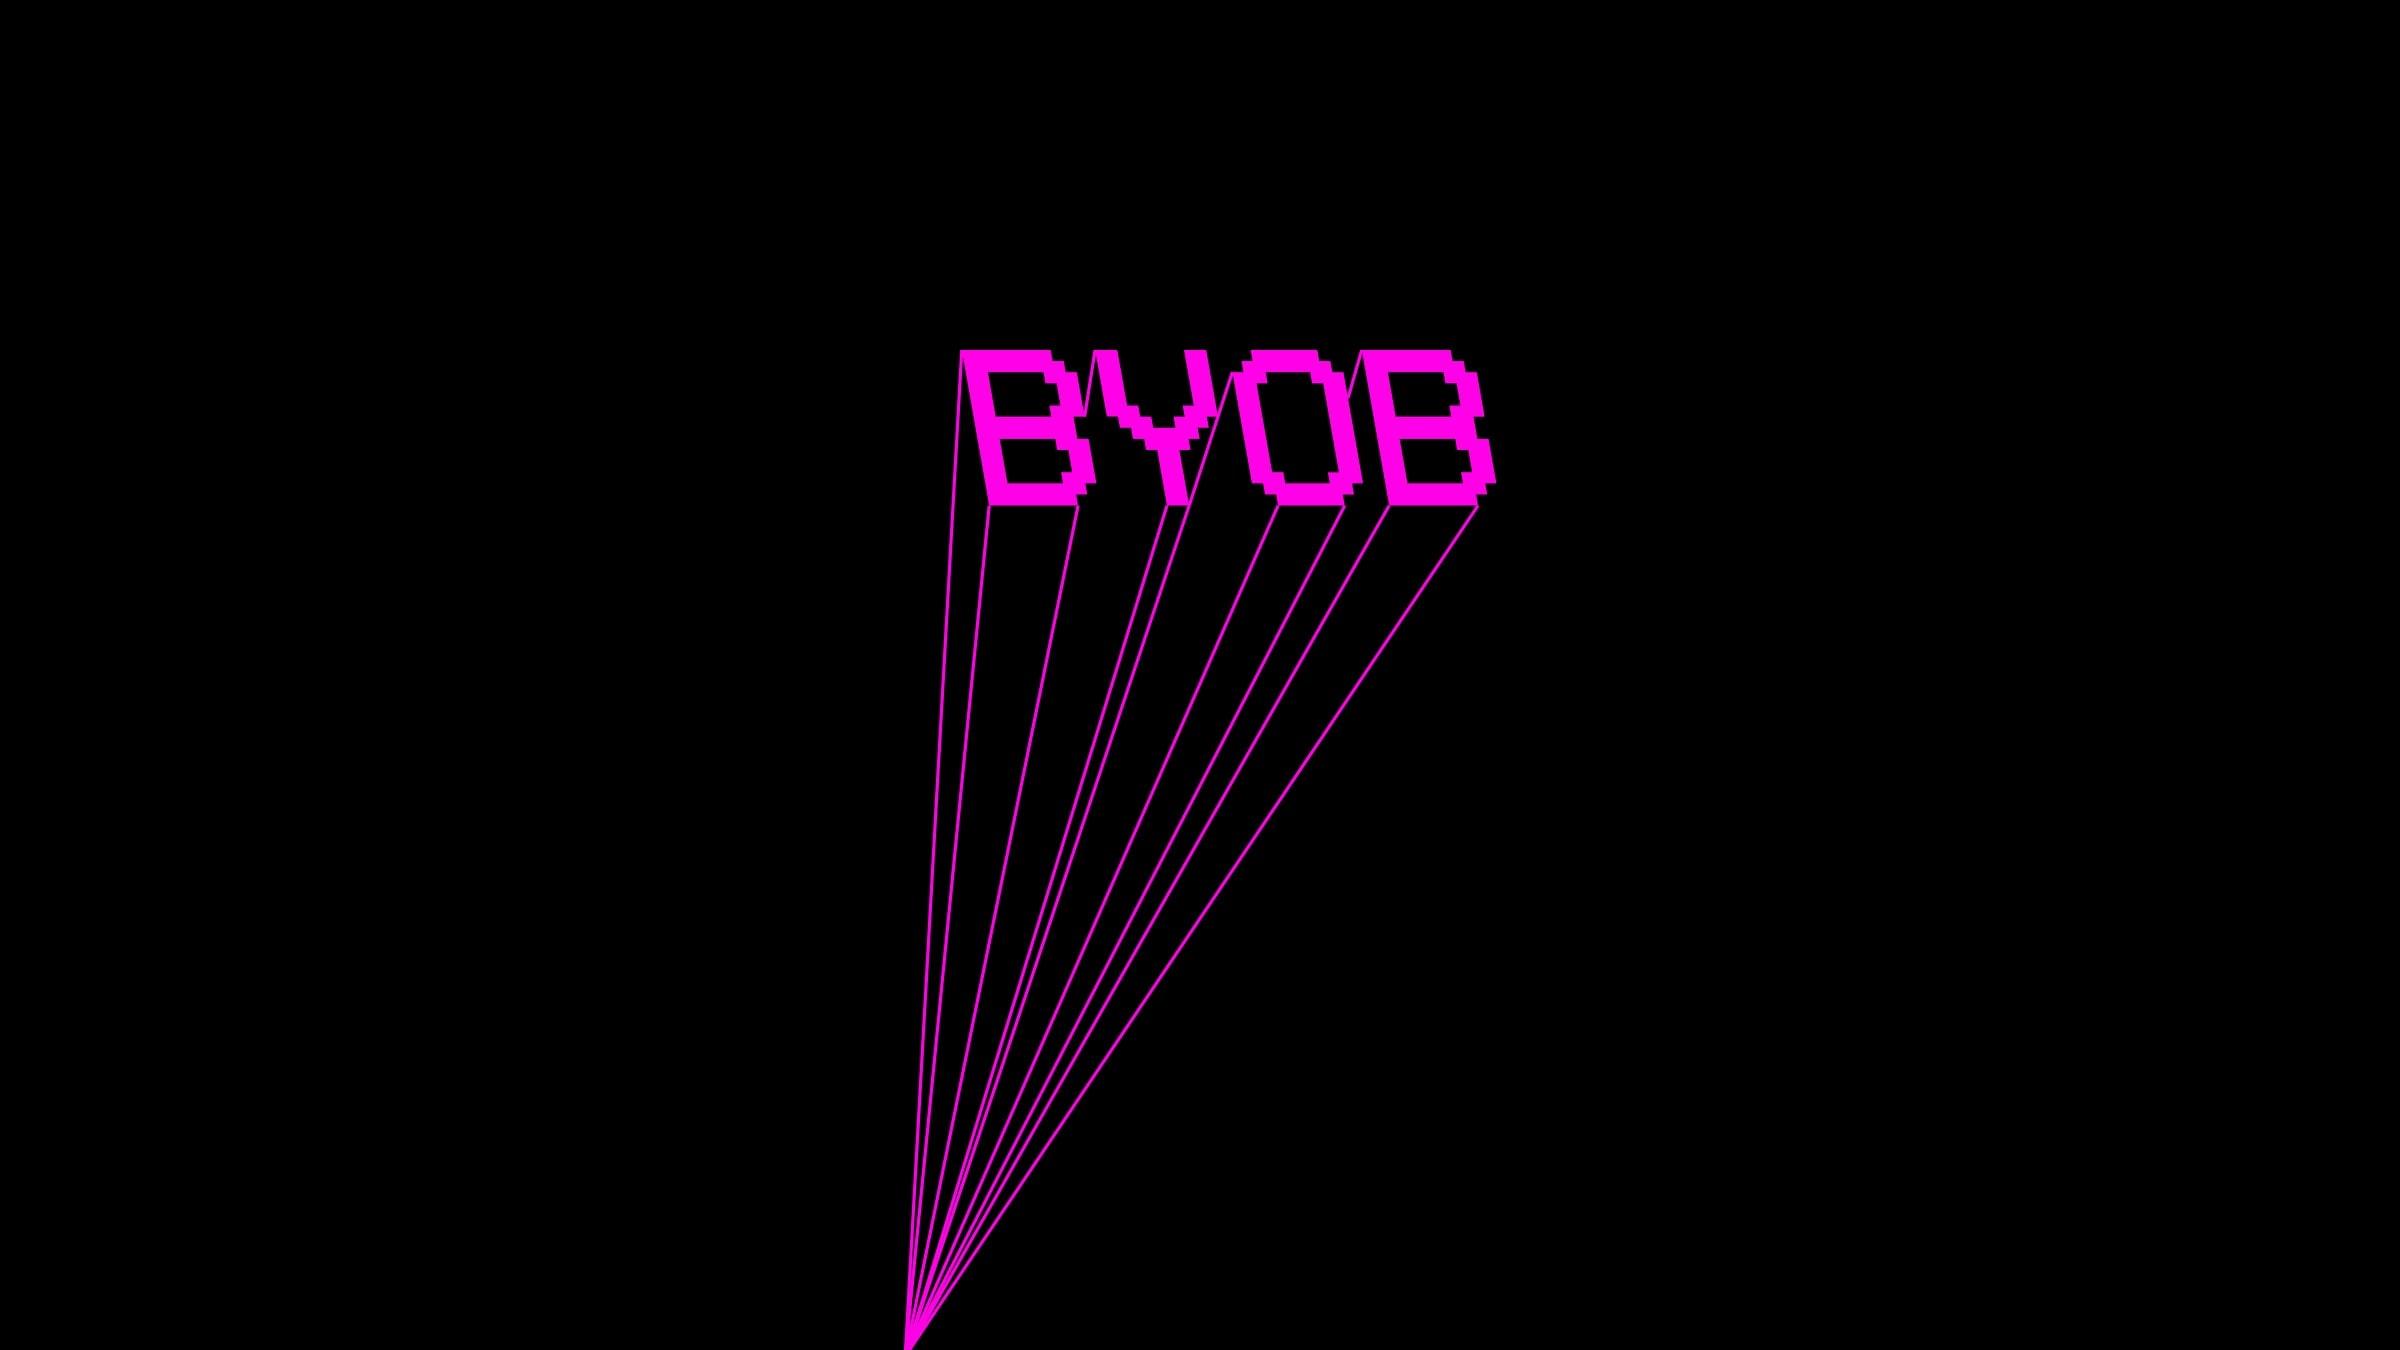 BYOB (Bring Your Own Beamer)